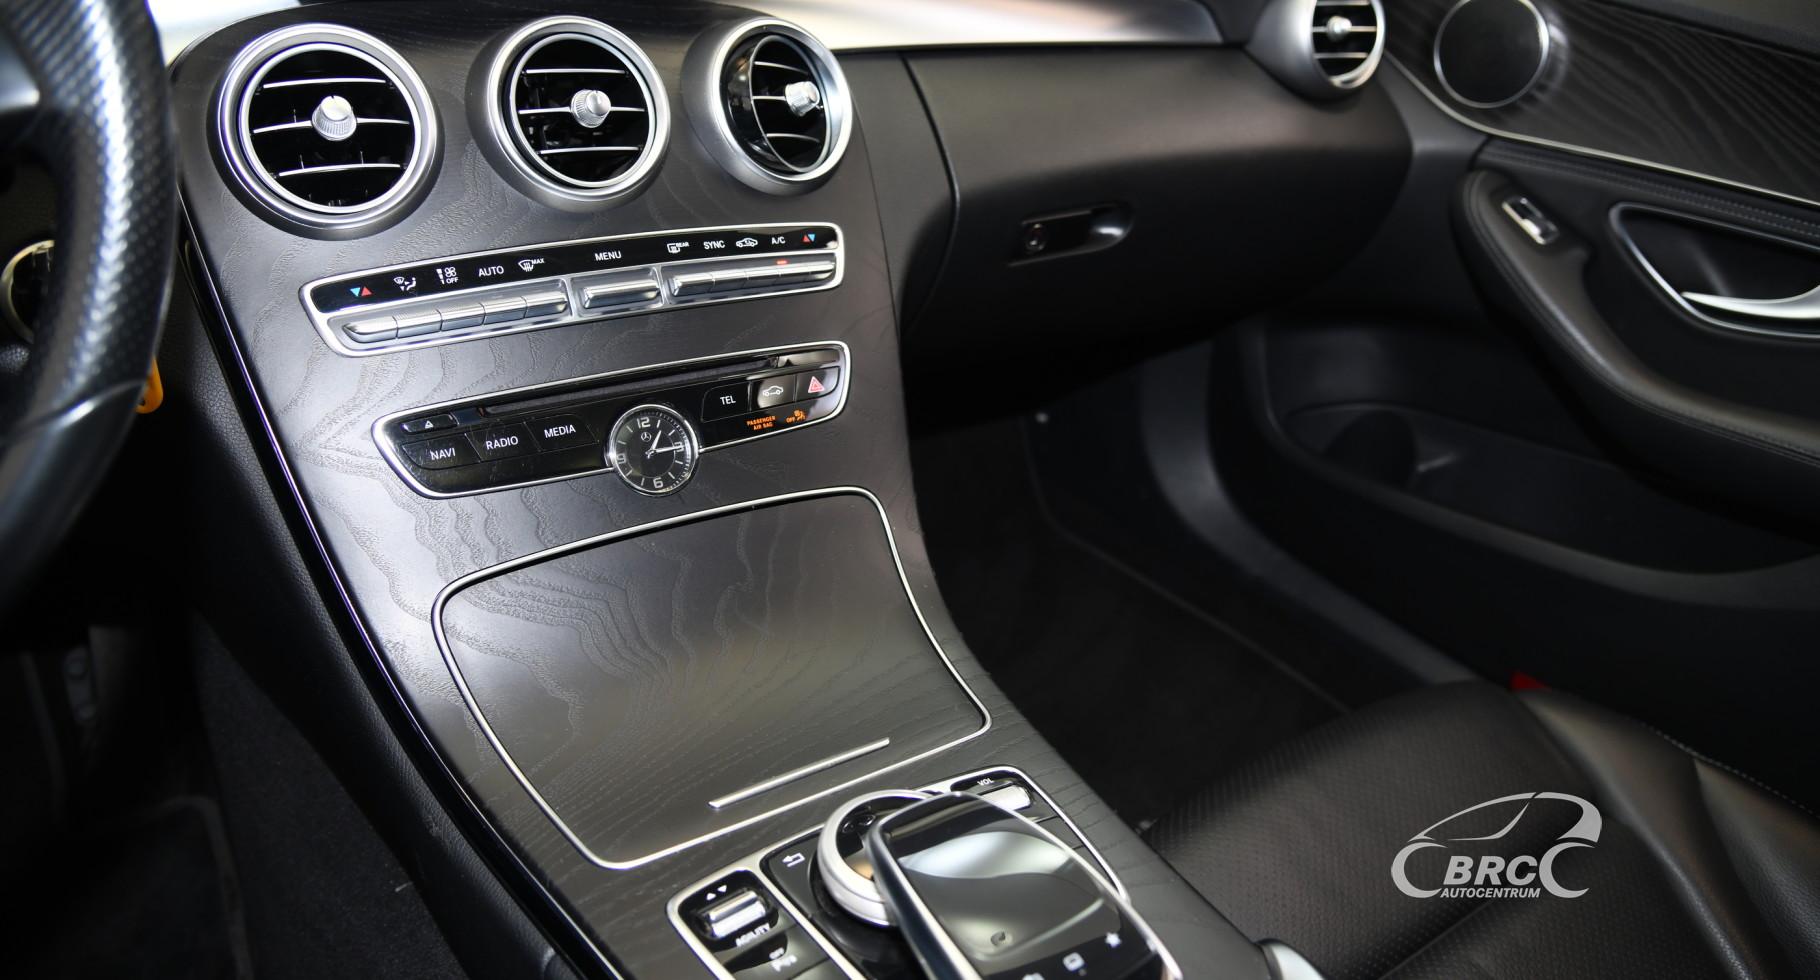 Mercedes-Benz C 200 BlueTEC AMG style Wagon Automatas